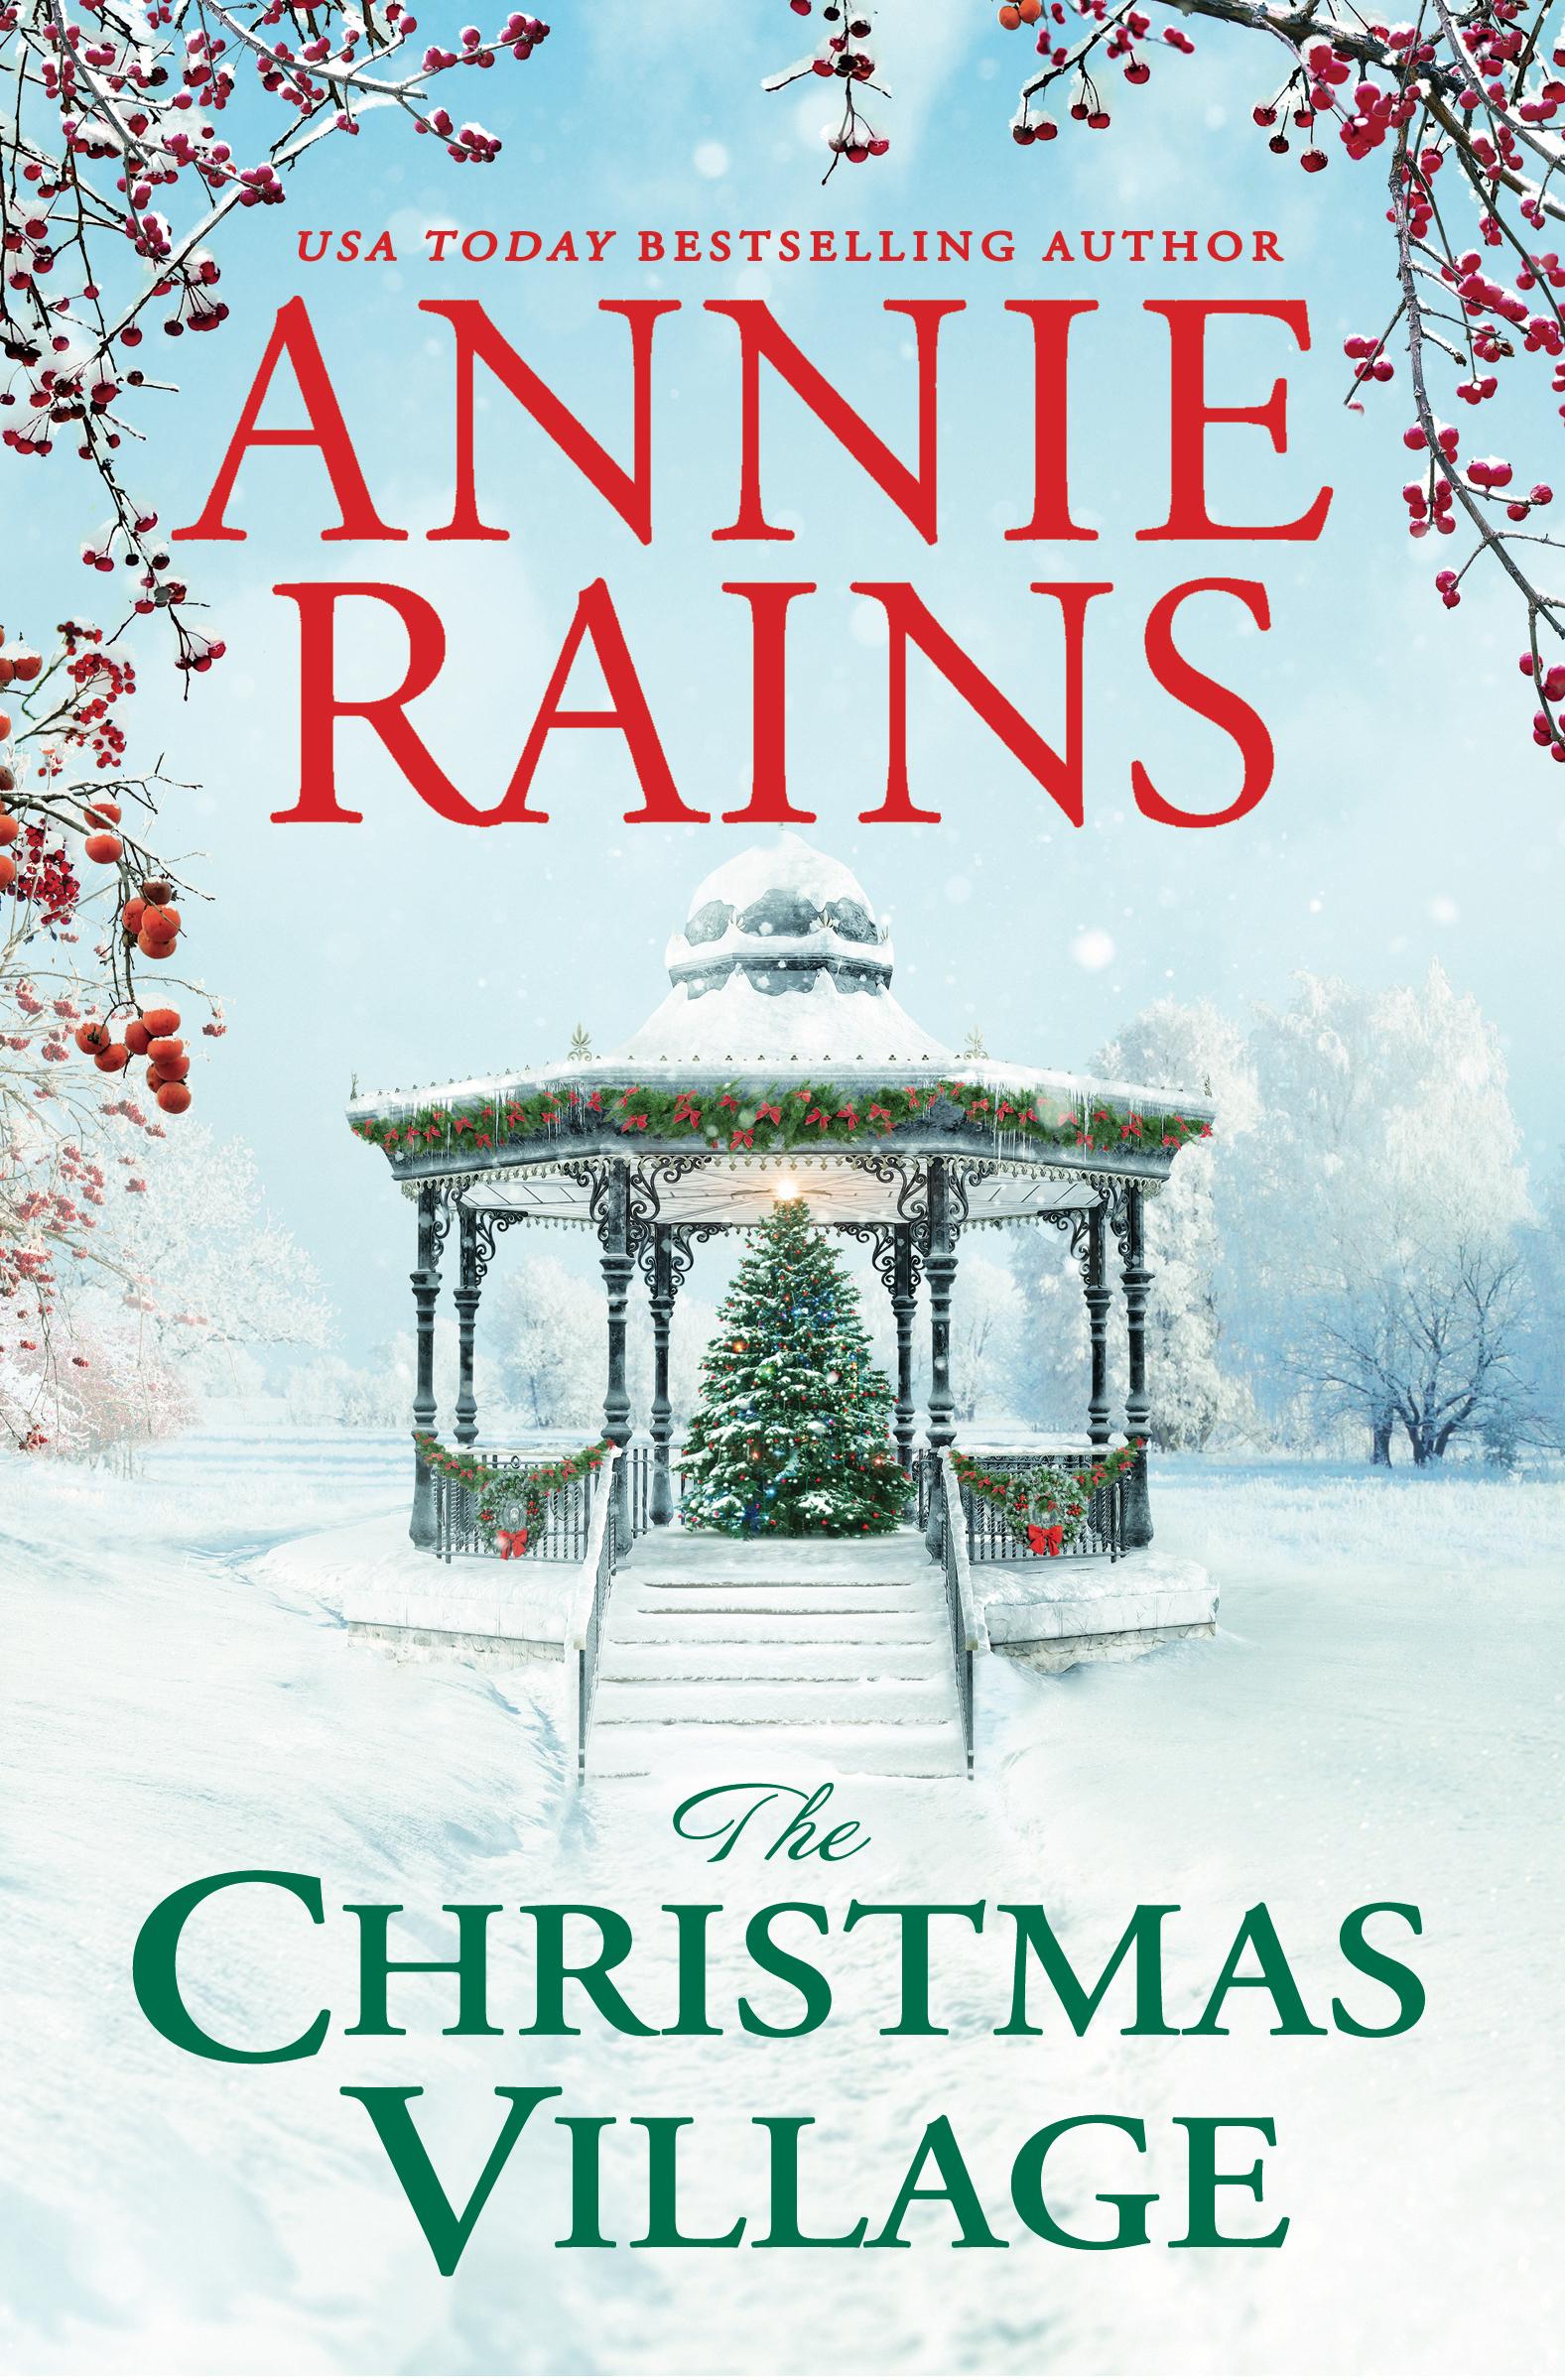 The Christmas Village by Annie Rains